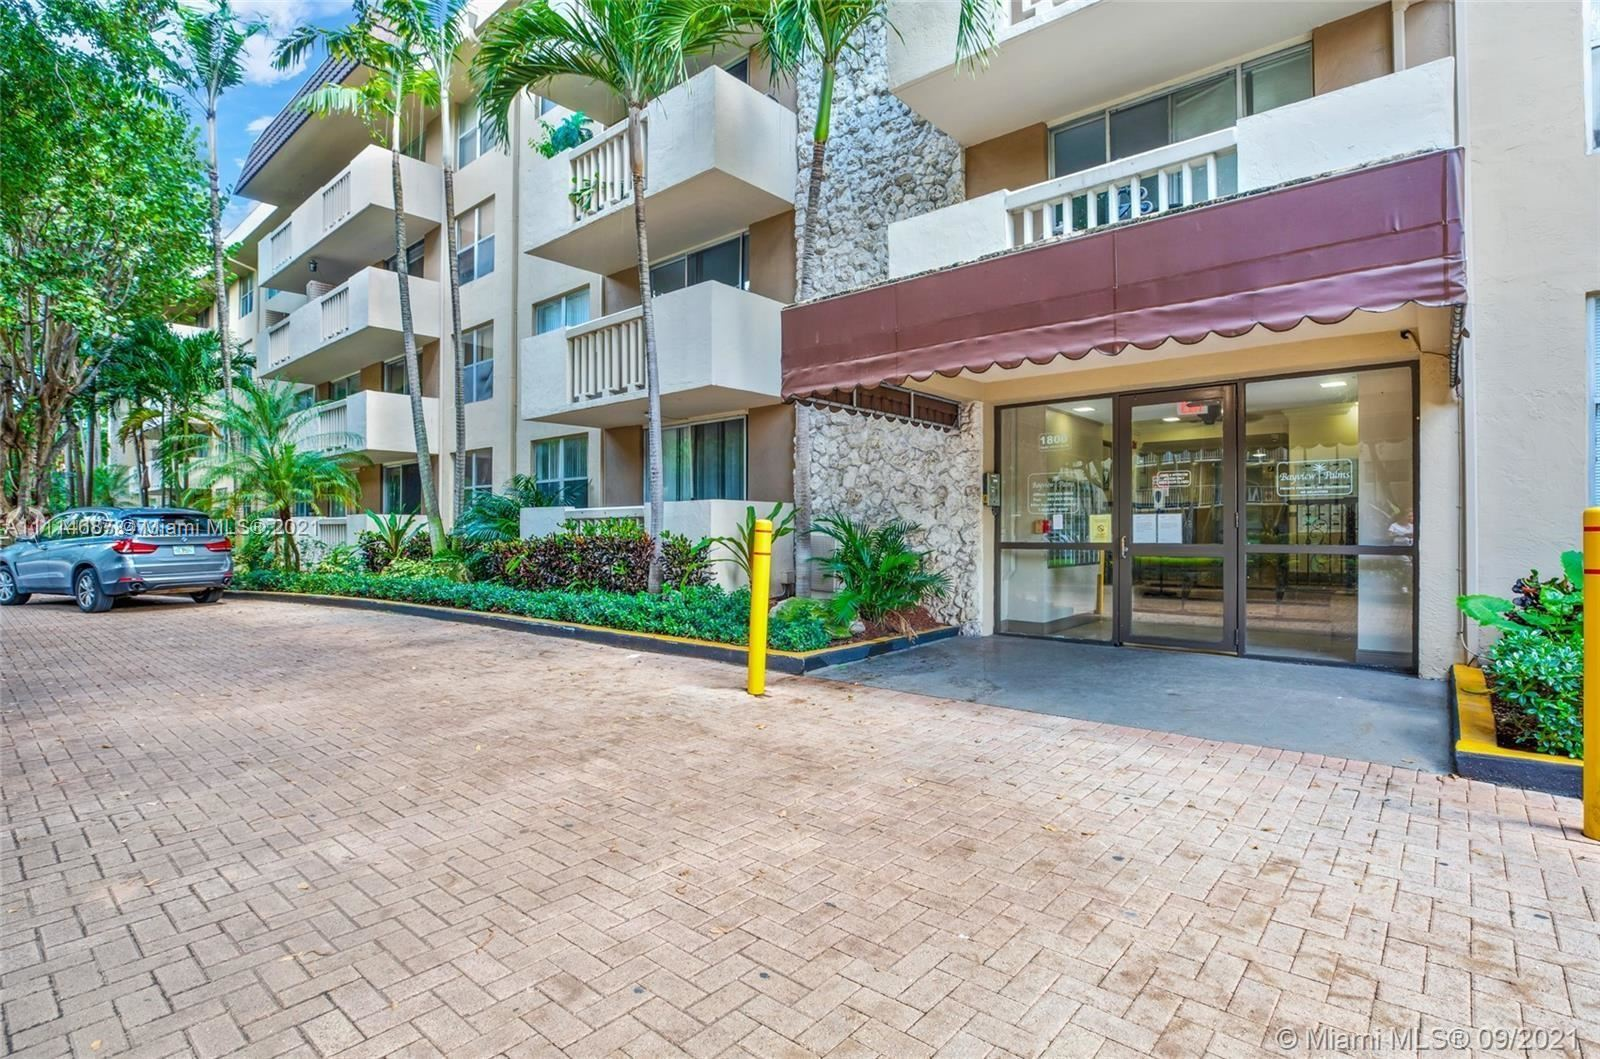 Photo of 1800 Sans Souci Blvd #429, North Miami, FL 33181 (MLS # A11114687)